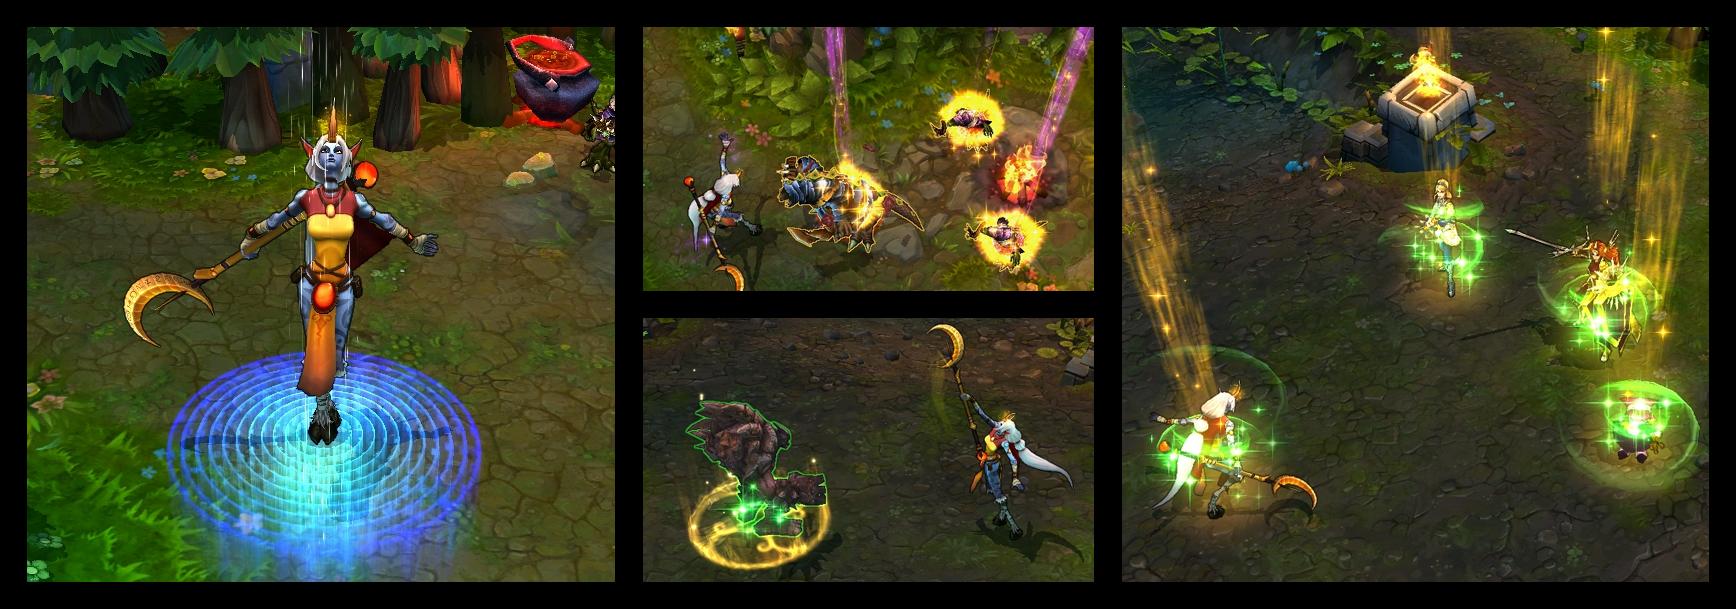 Soraka Screenshots.jpg